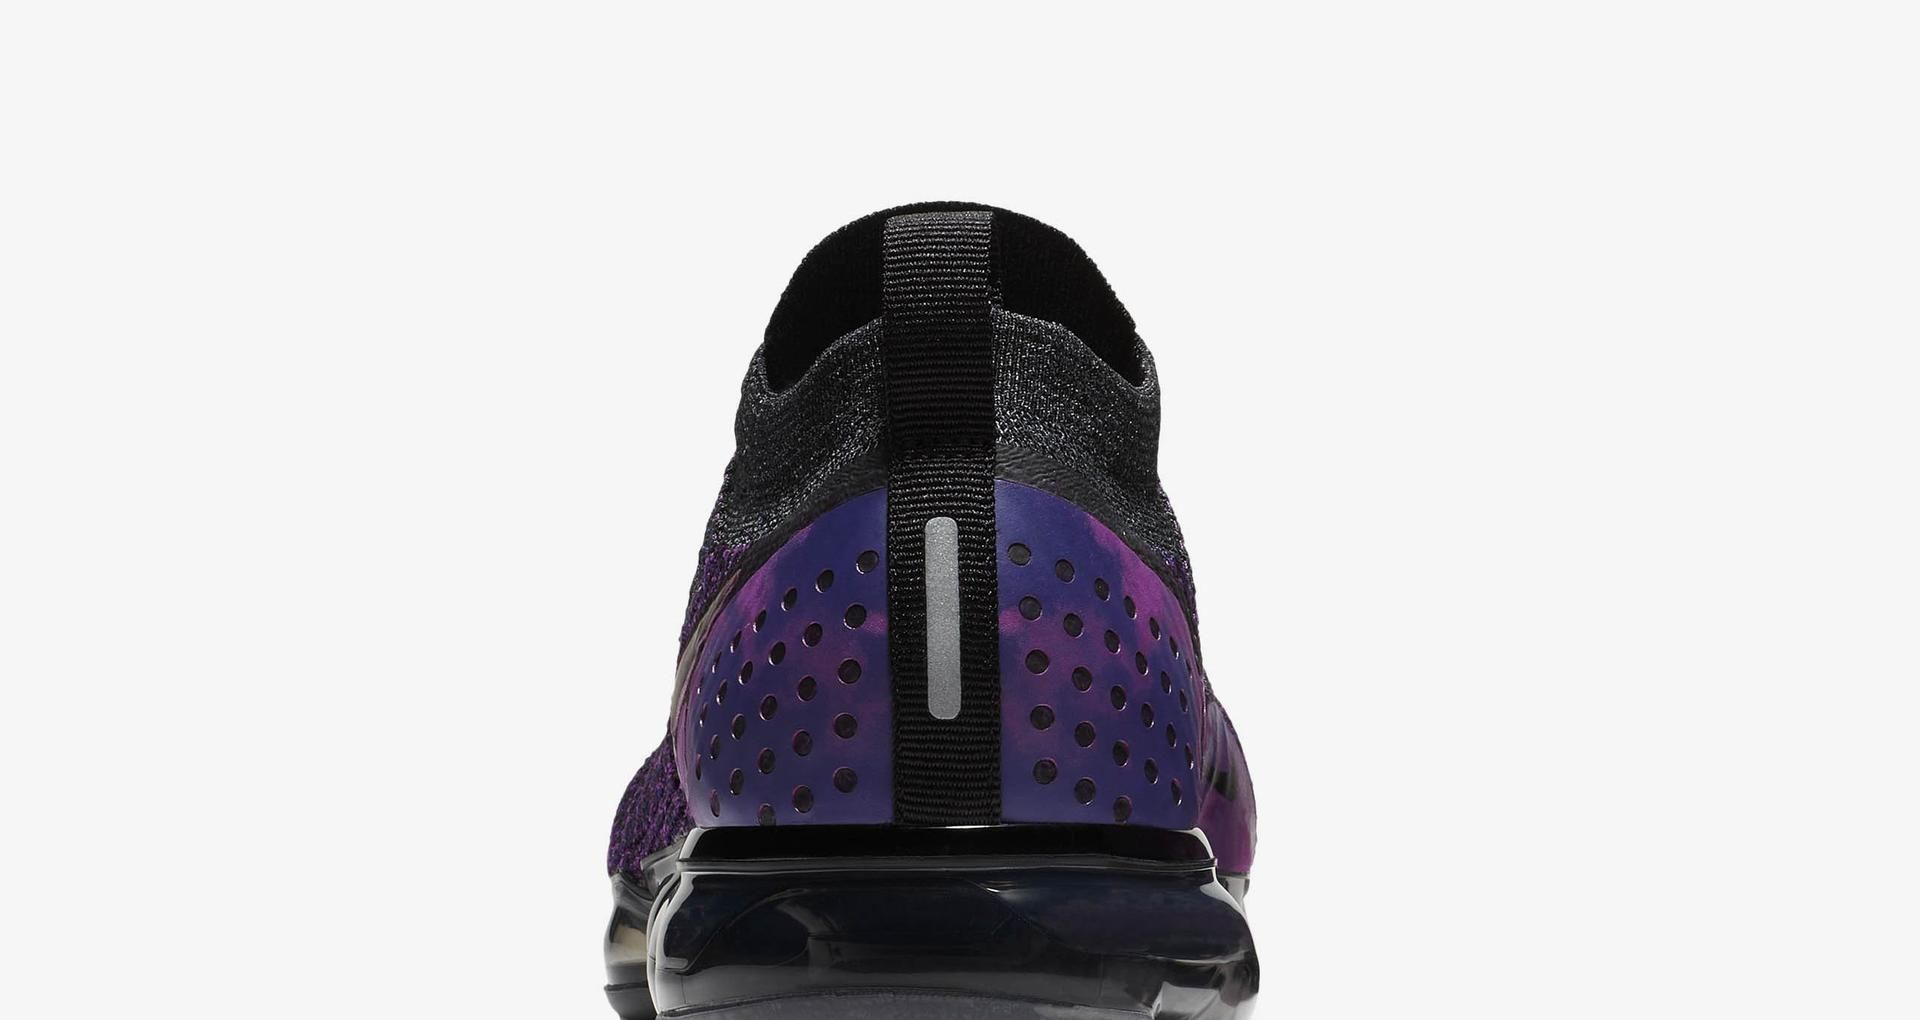 30a4fb23d5d49 Nike Air Vapormax Flyknit 2  Black   Vivid Purple   Night Purple .